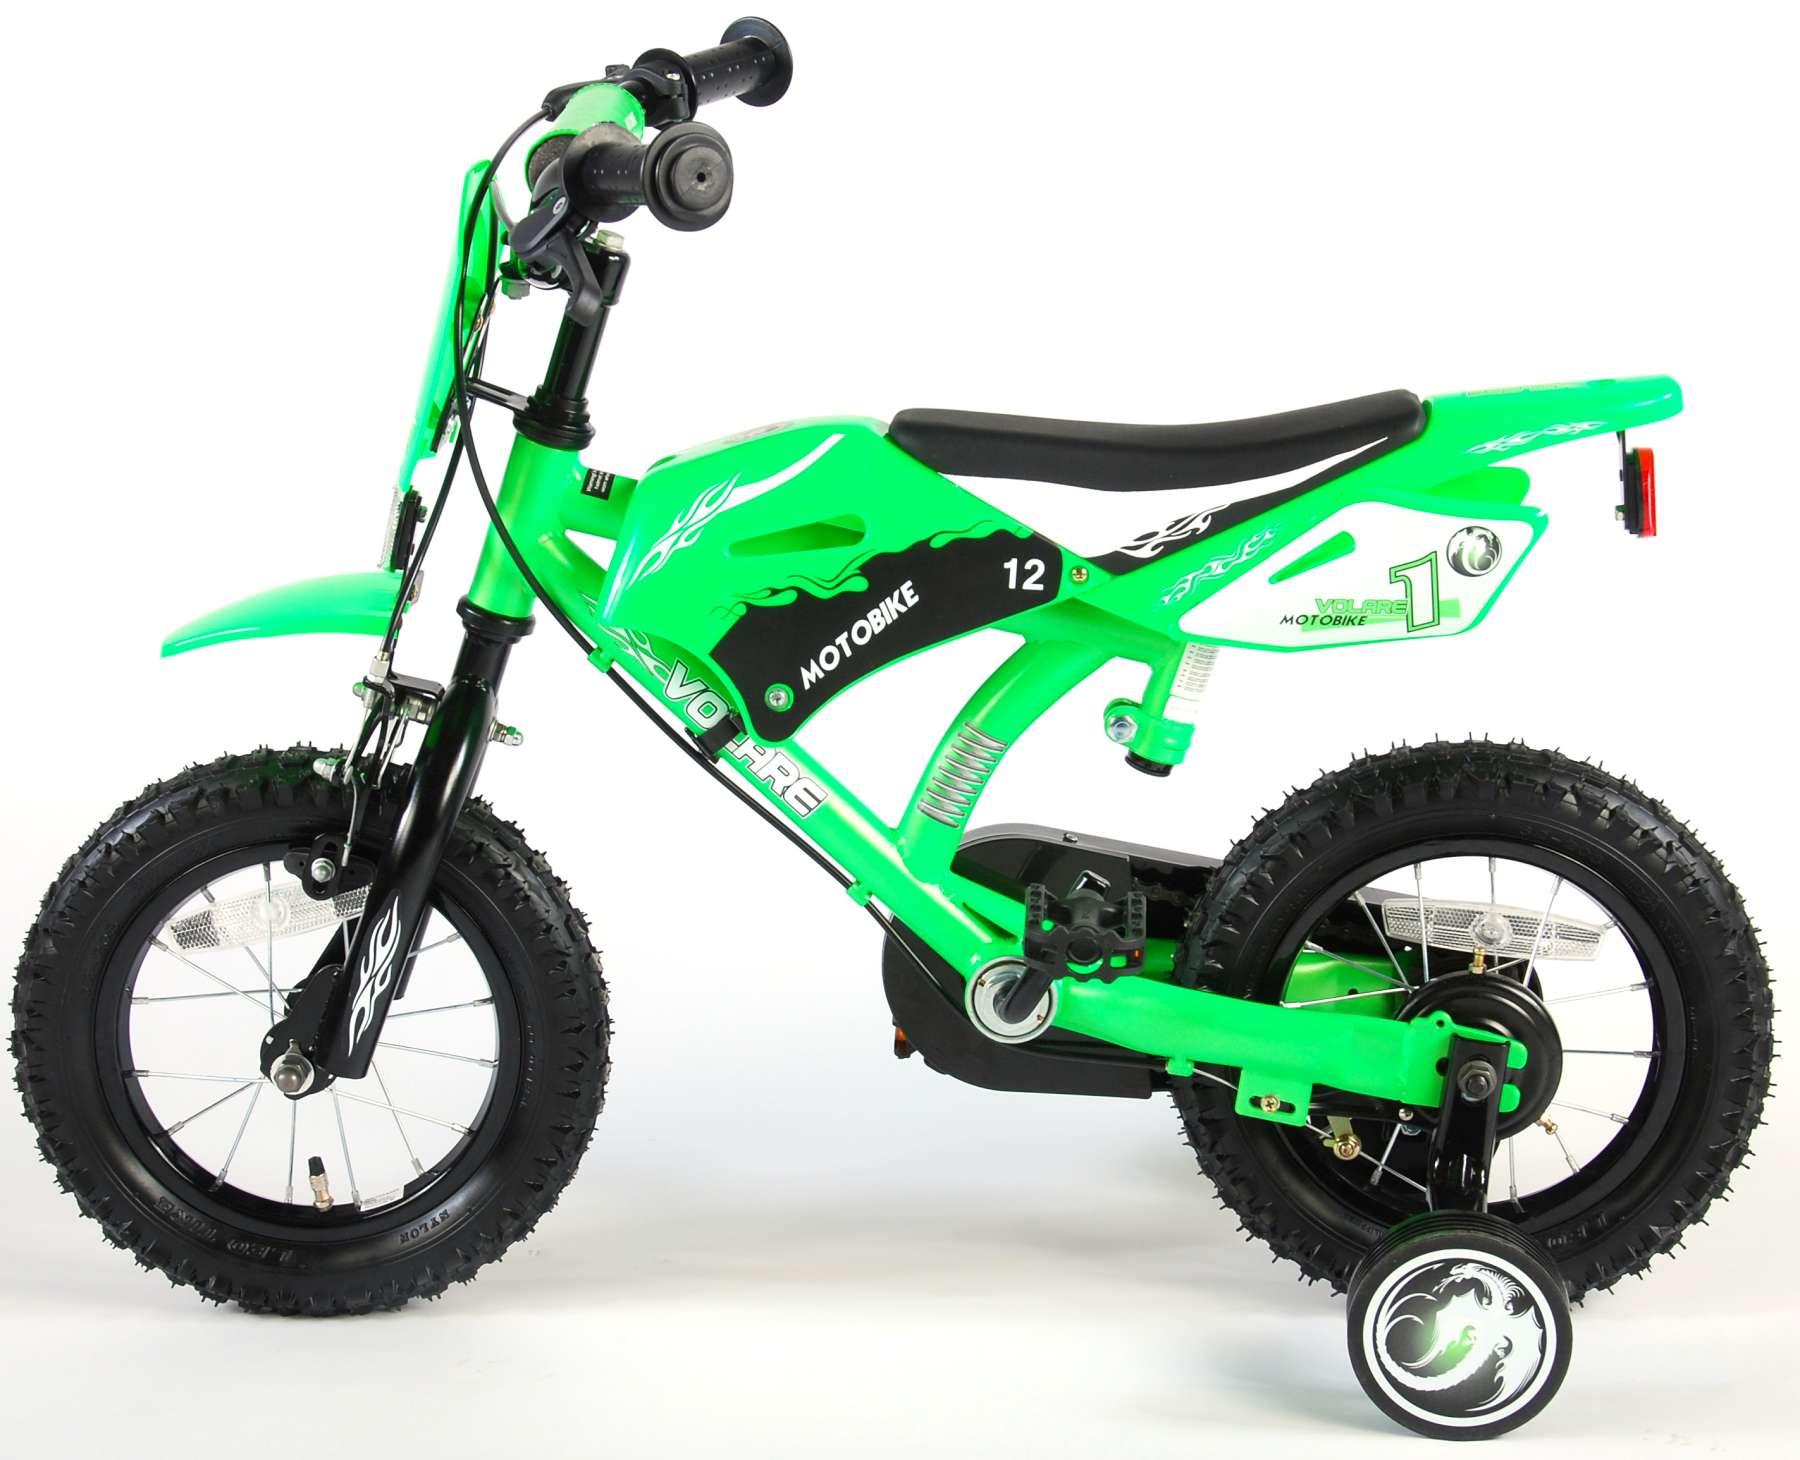 Bicicleta Motorbike de 12 pulgadas Verde - vista lateral izq.